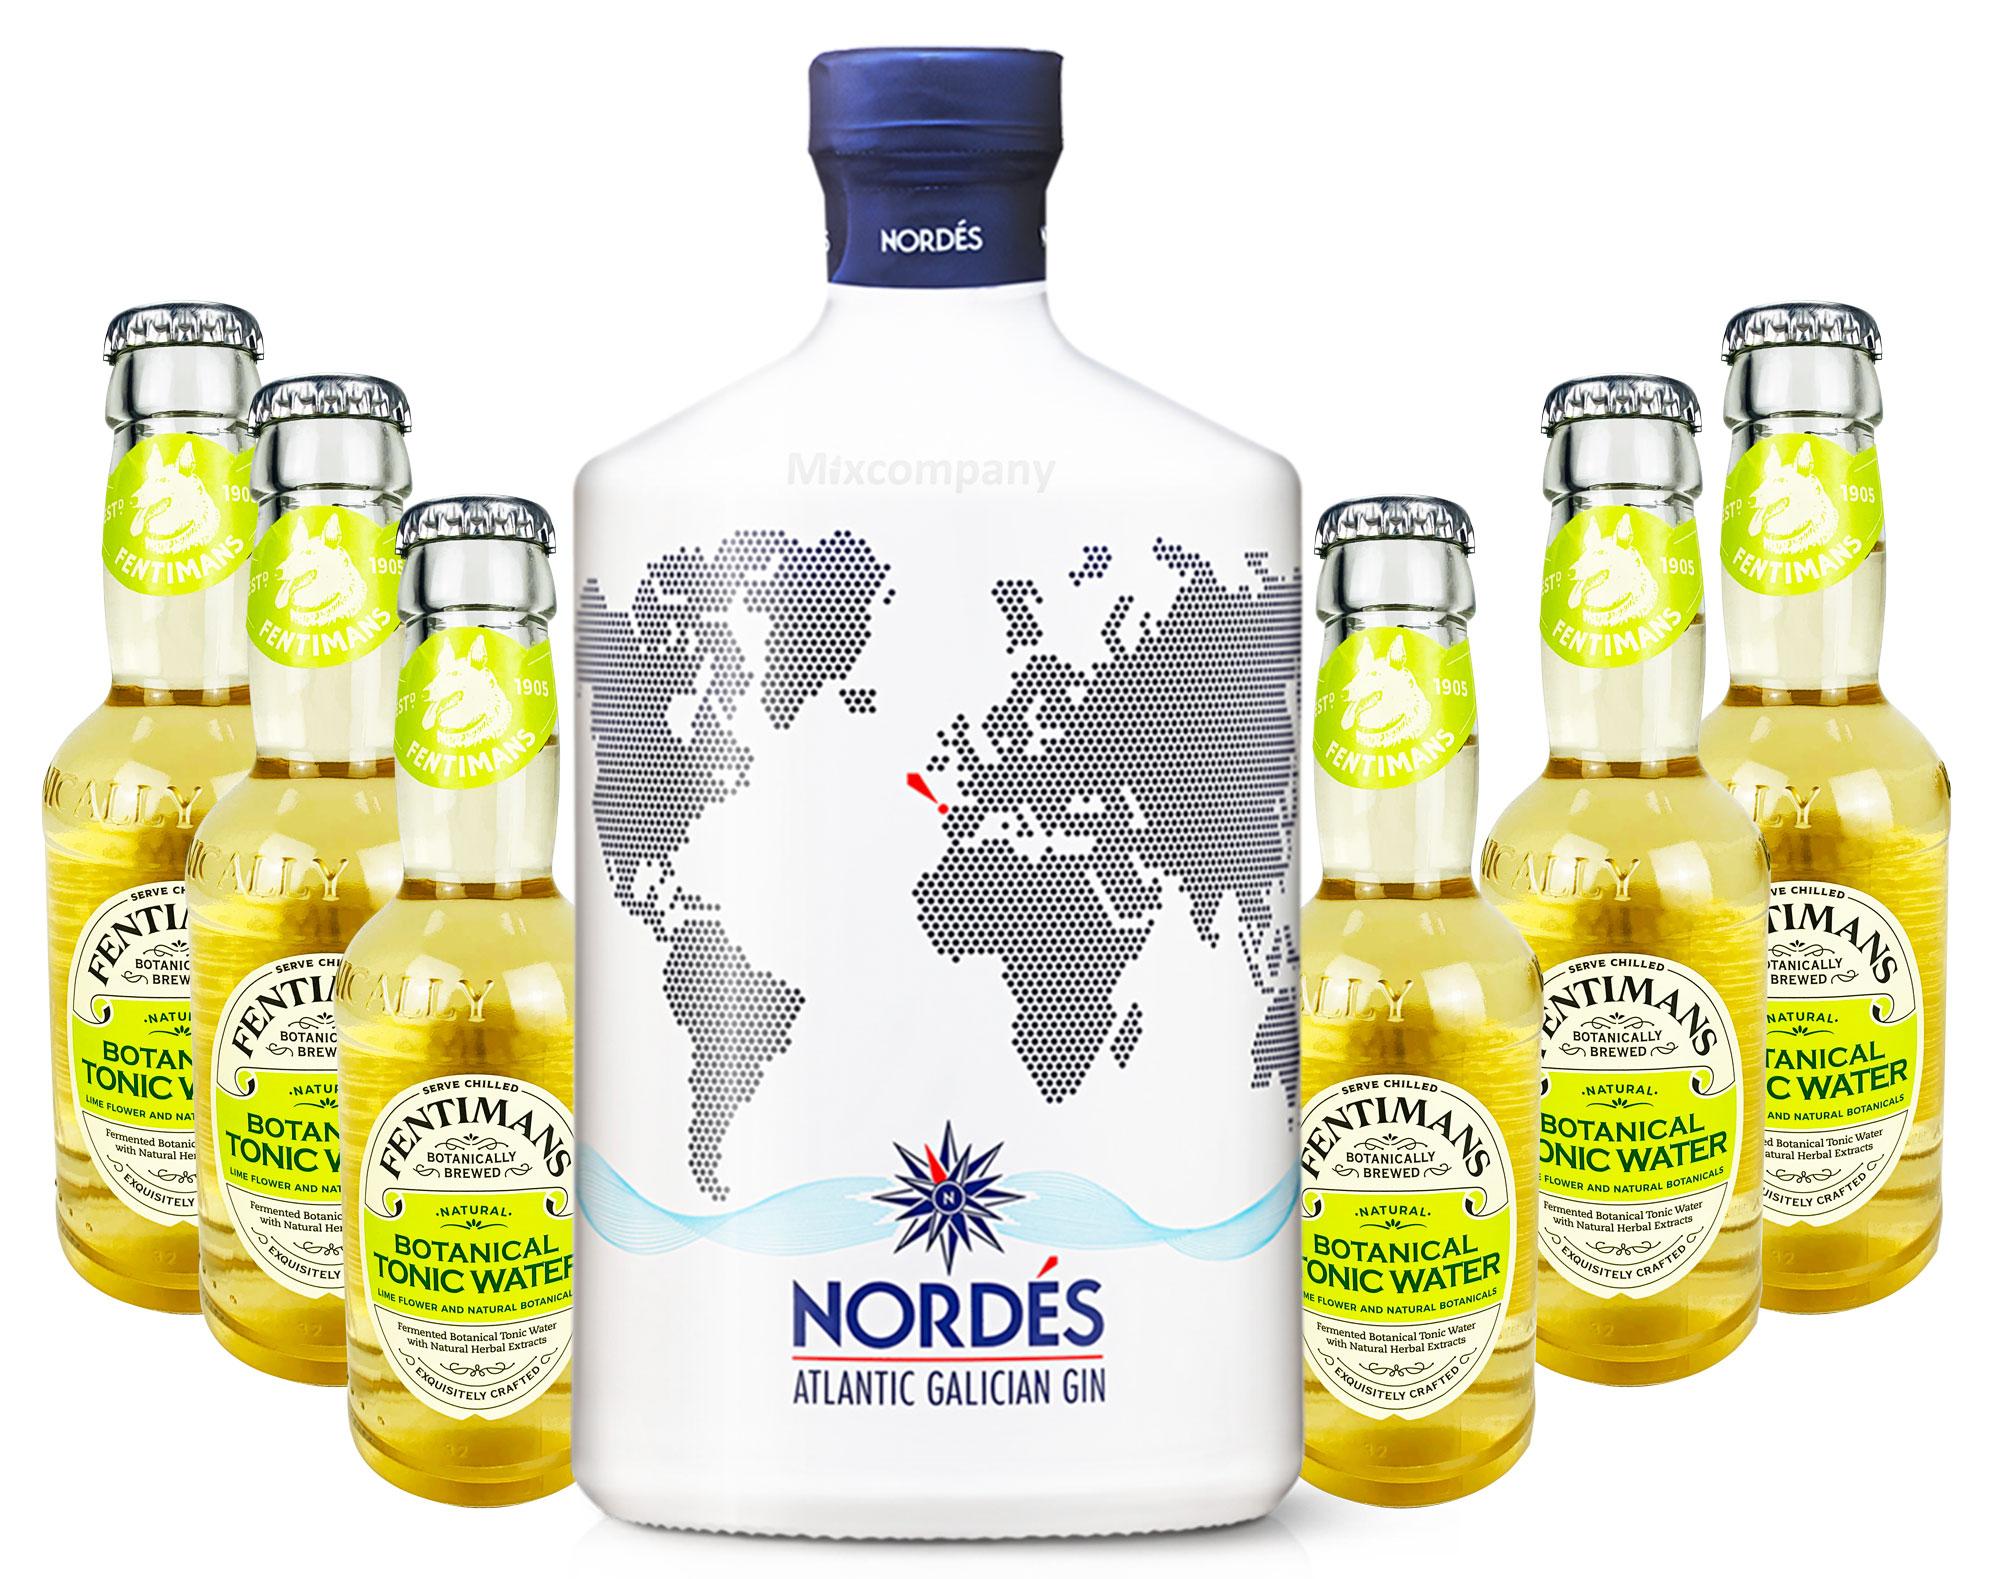 Nordes Atlantic Galician Gin aus Galizien 0,7l (40% Vol) + 6 x Fentimans Botanical Tonic Water 0,2l MEHRWEG inkl. Pfand- [Enthält Sulfite]